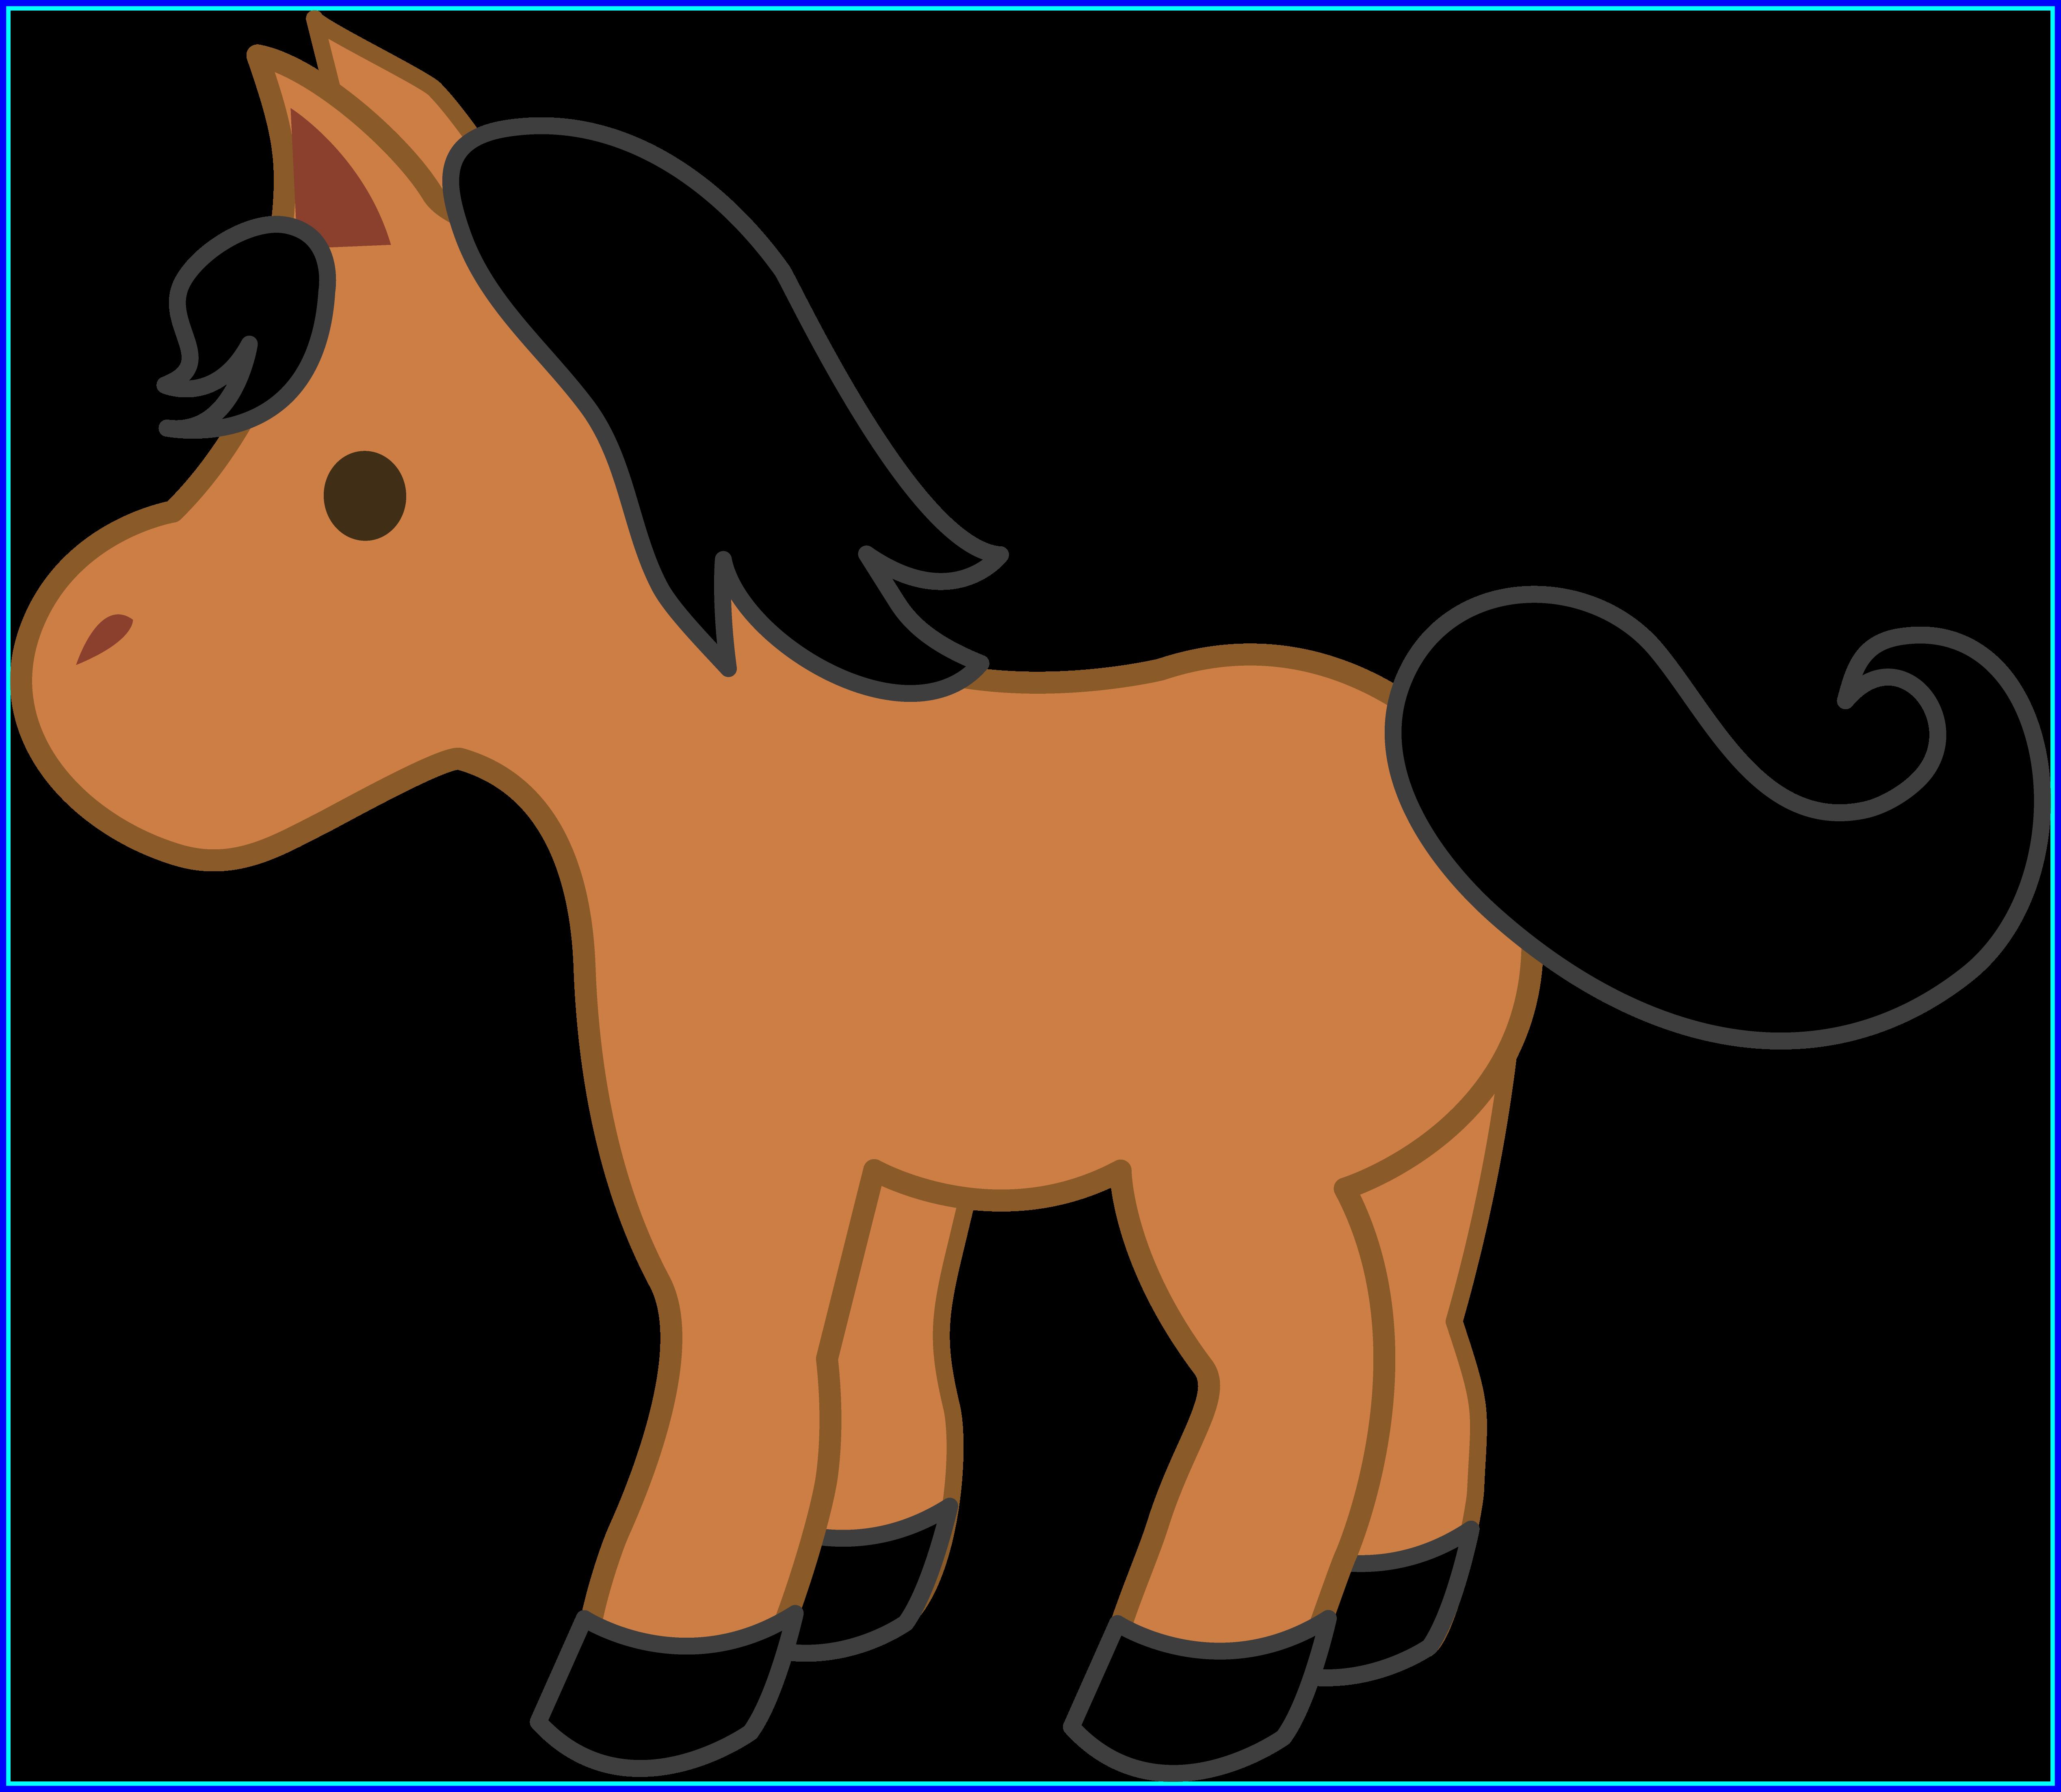 Cute baby at getdrawings. Horses clipart kid